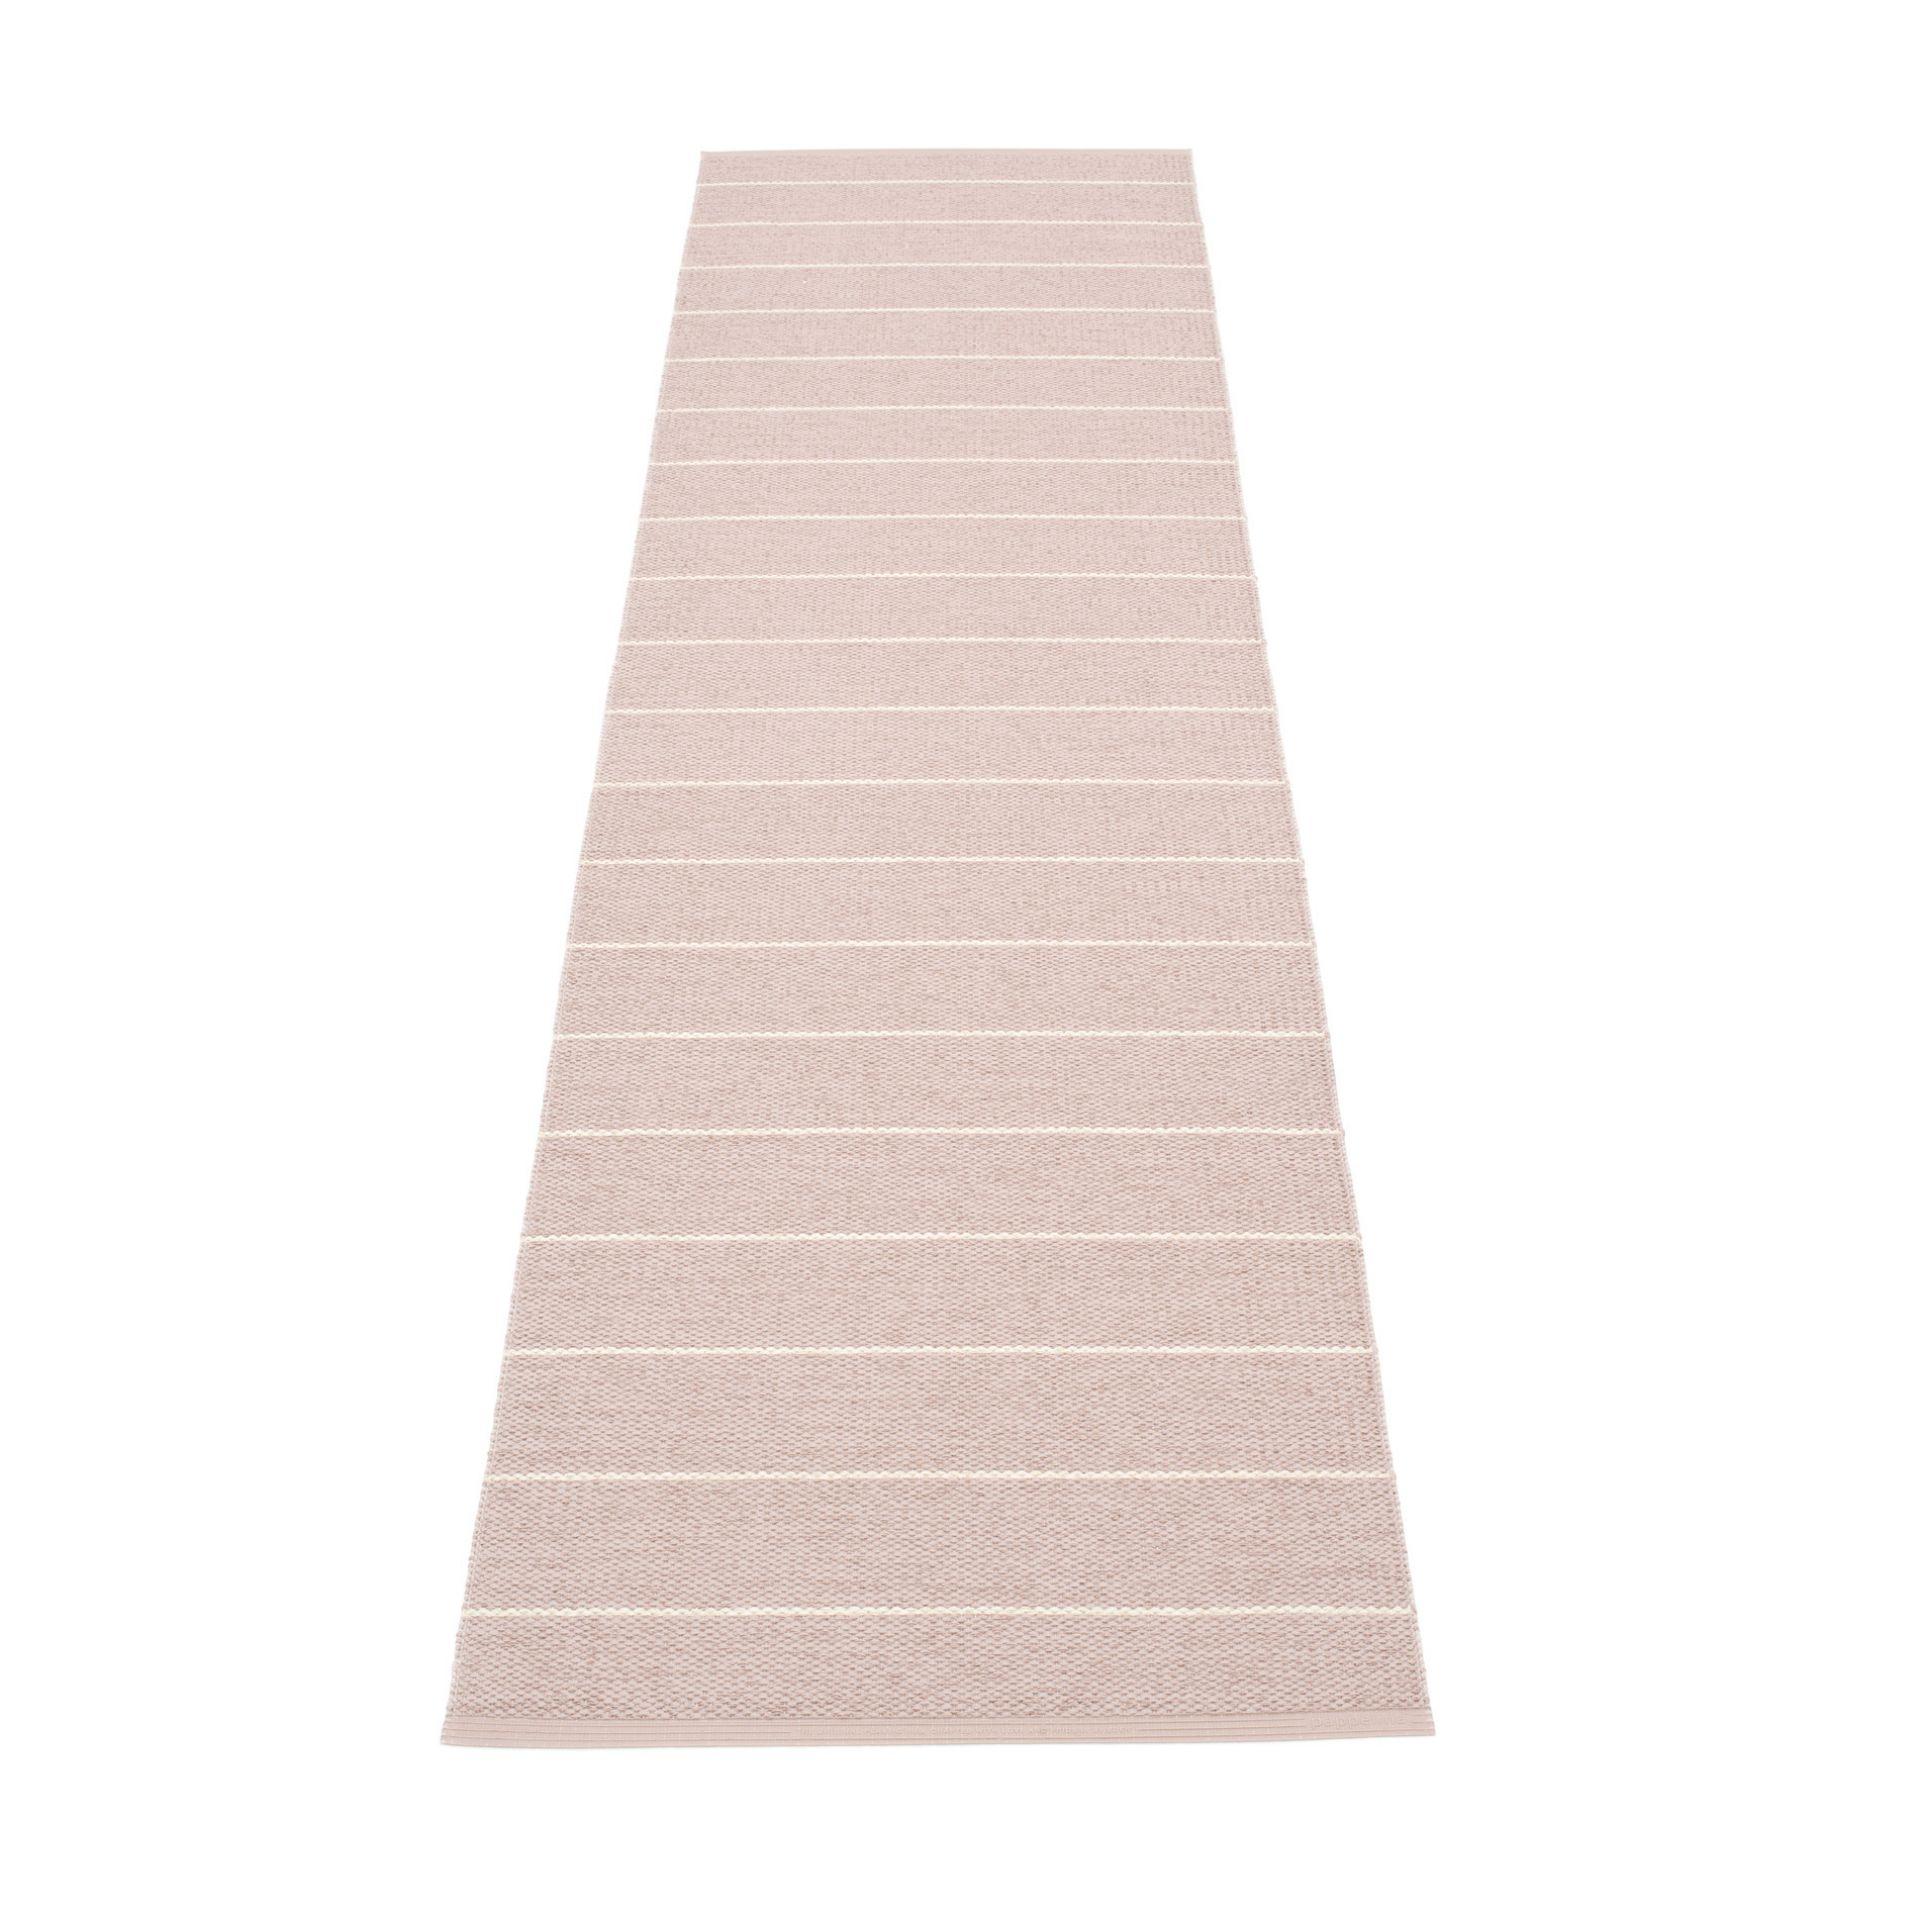 Carl Kunststoffteppich 70x270 cm Pappelina Leinen/ Beige